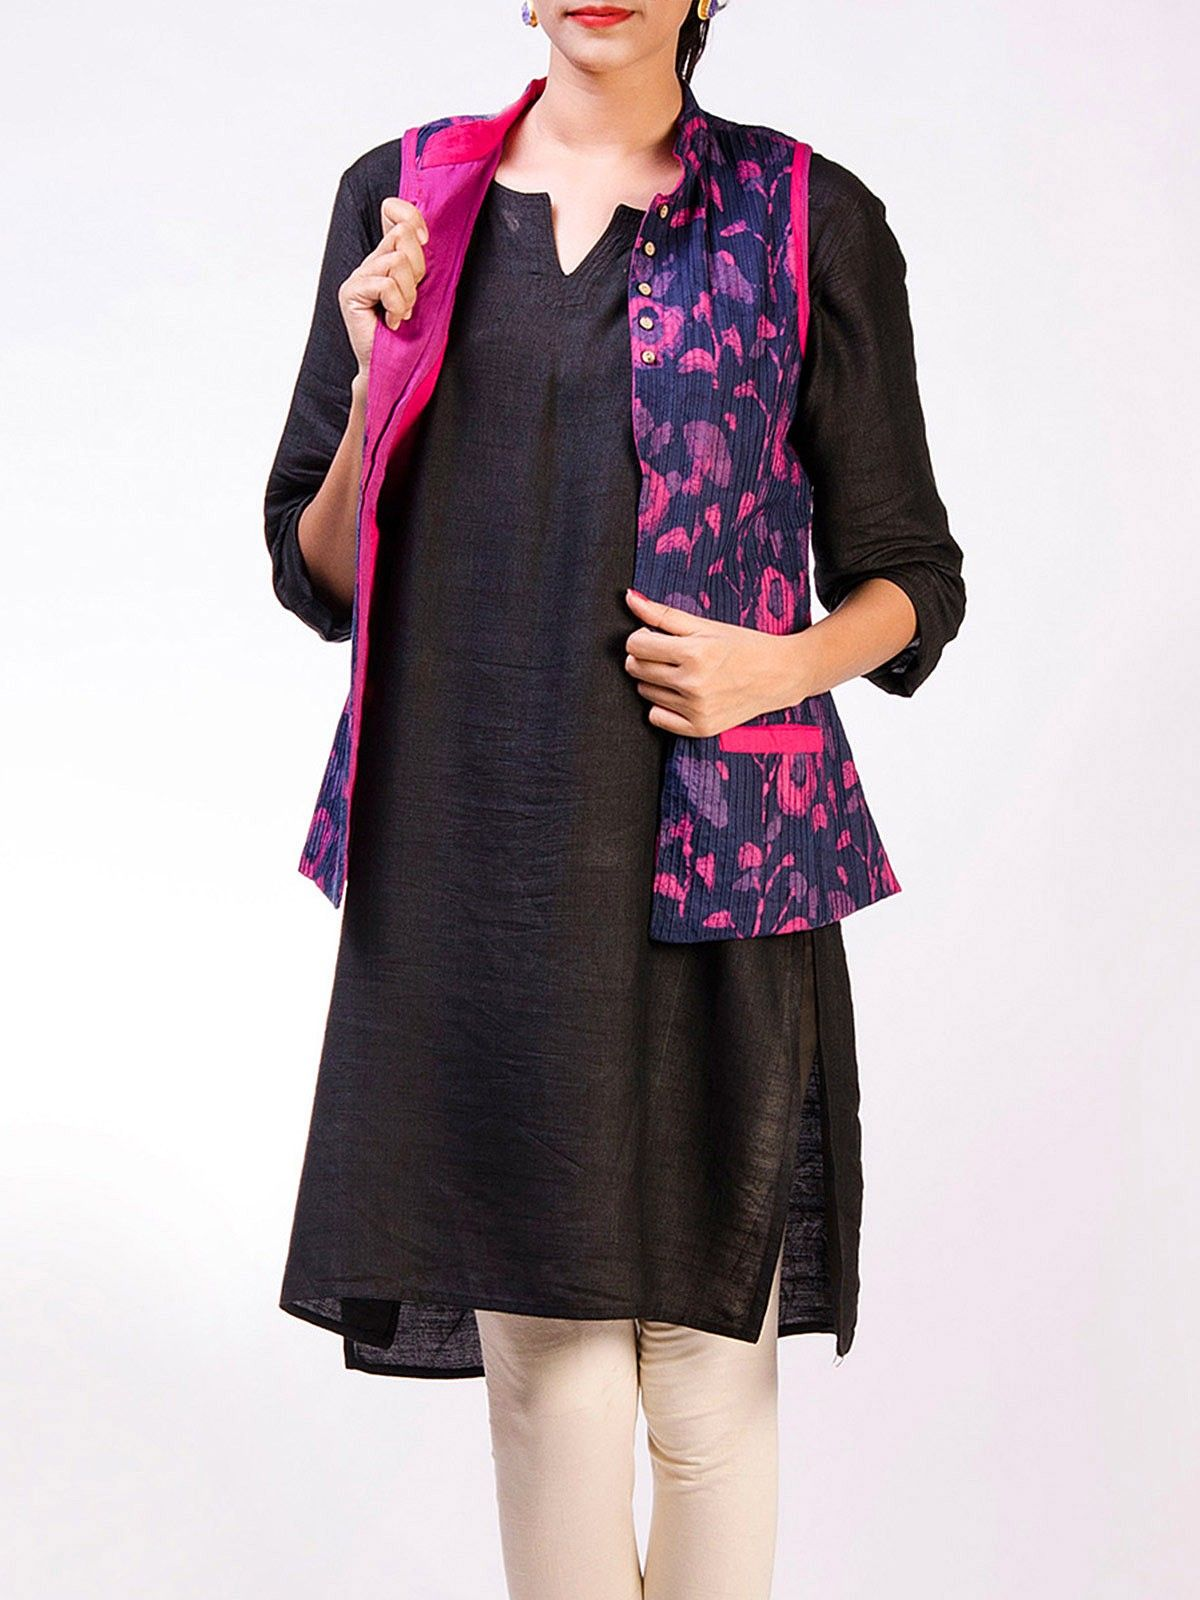 Purple cotton hand block printed sleveeless pintuck Jacket